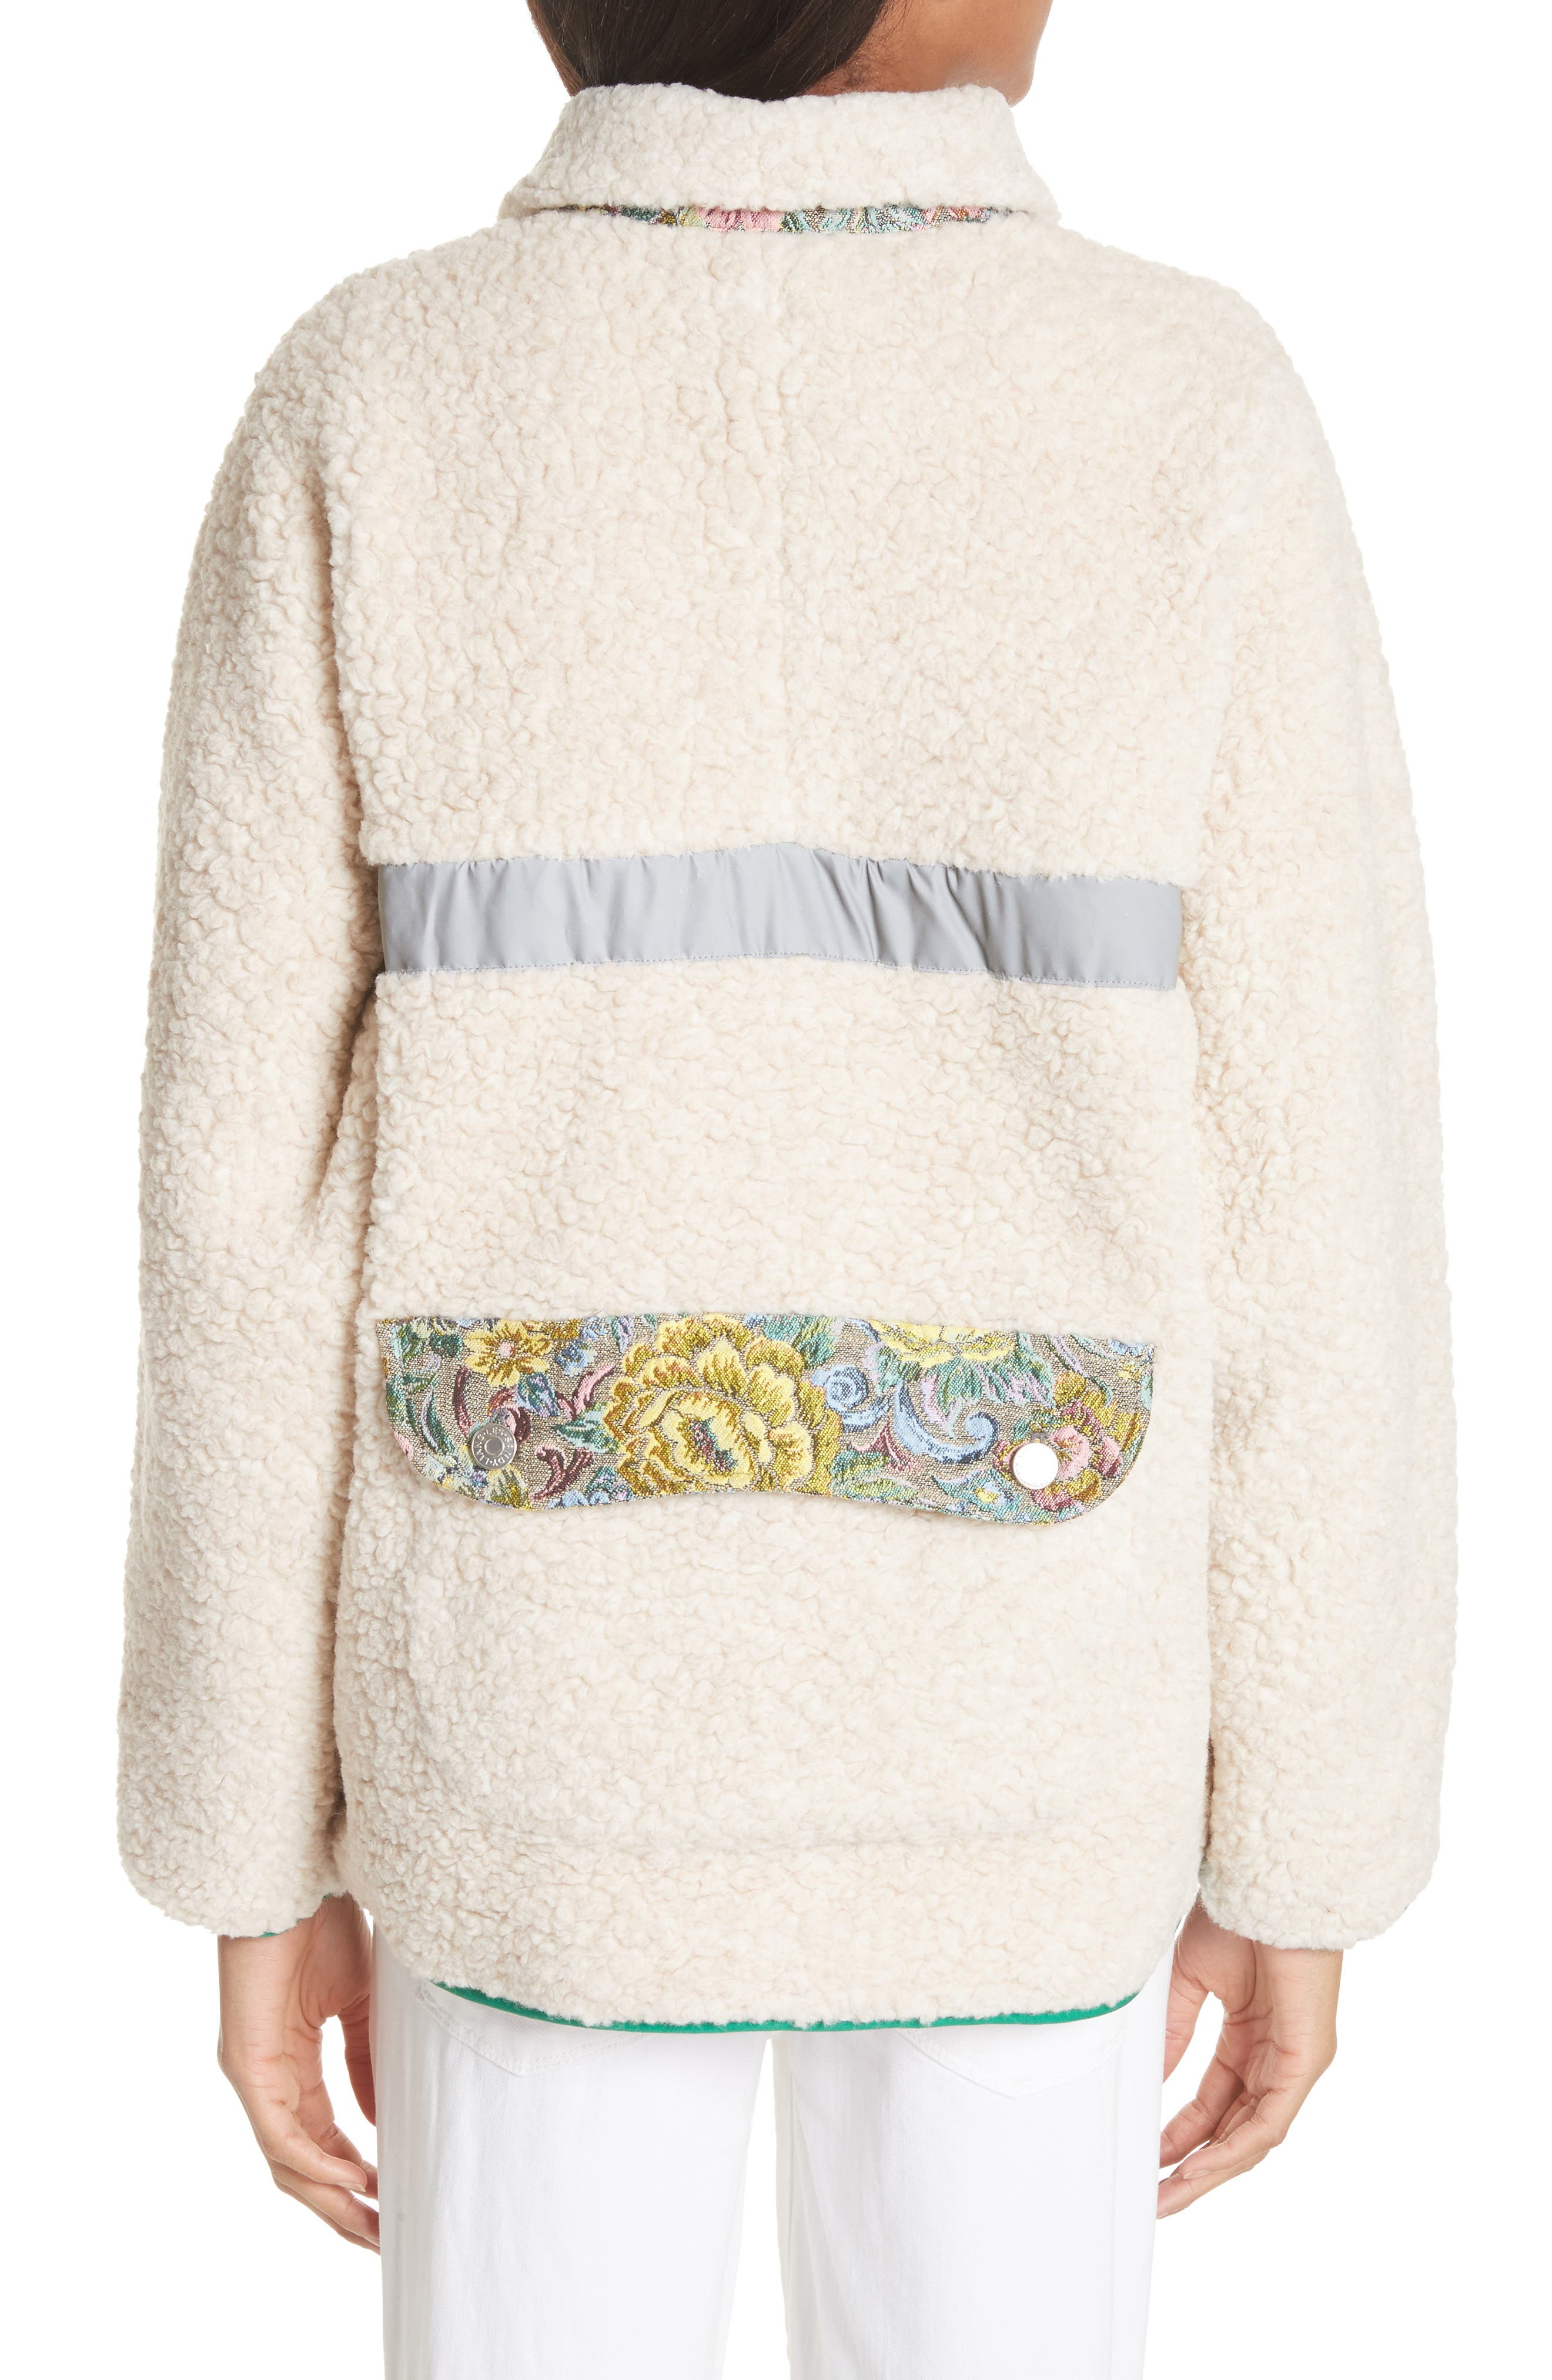 Bayside Floral Trim Fleece Jacket,                             Alternate thumbnail 2, color,                             Creamy